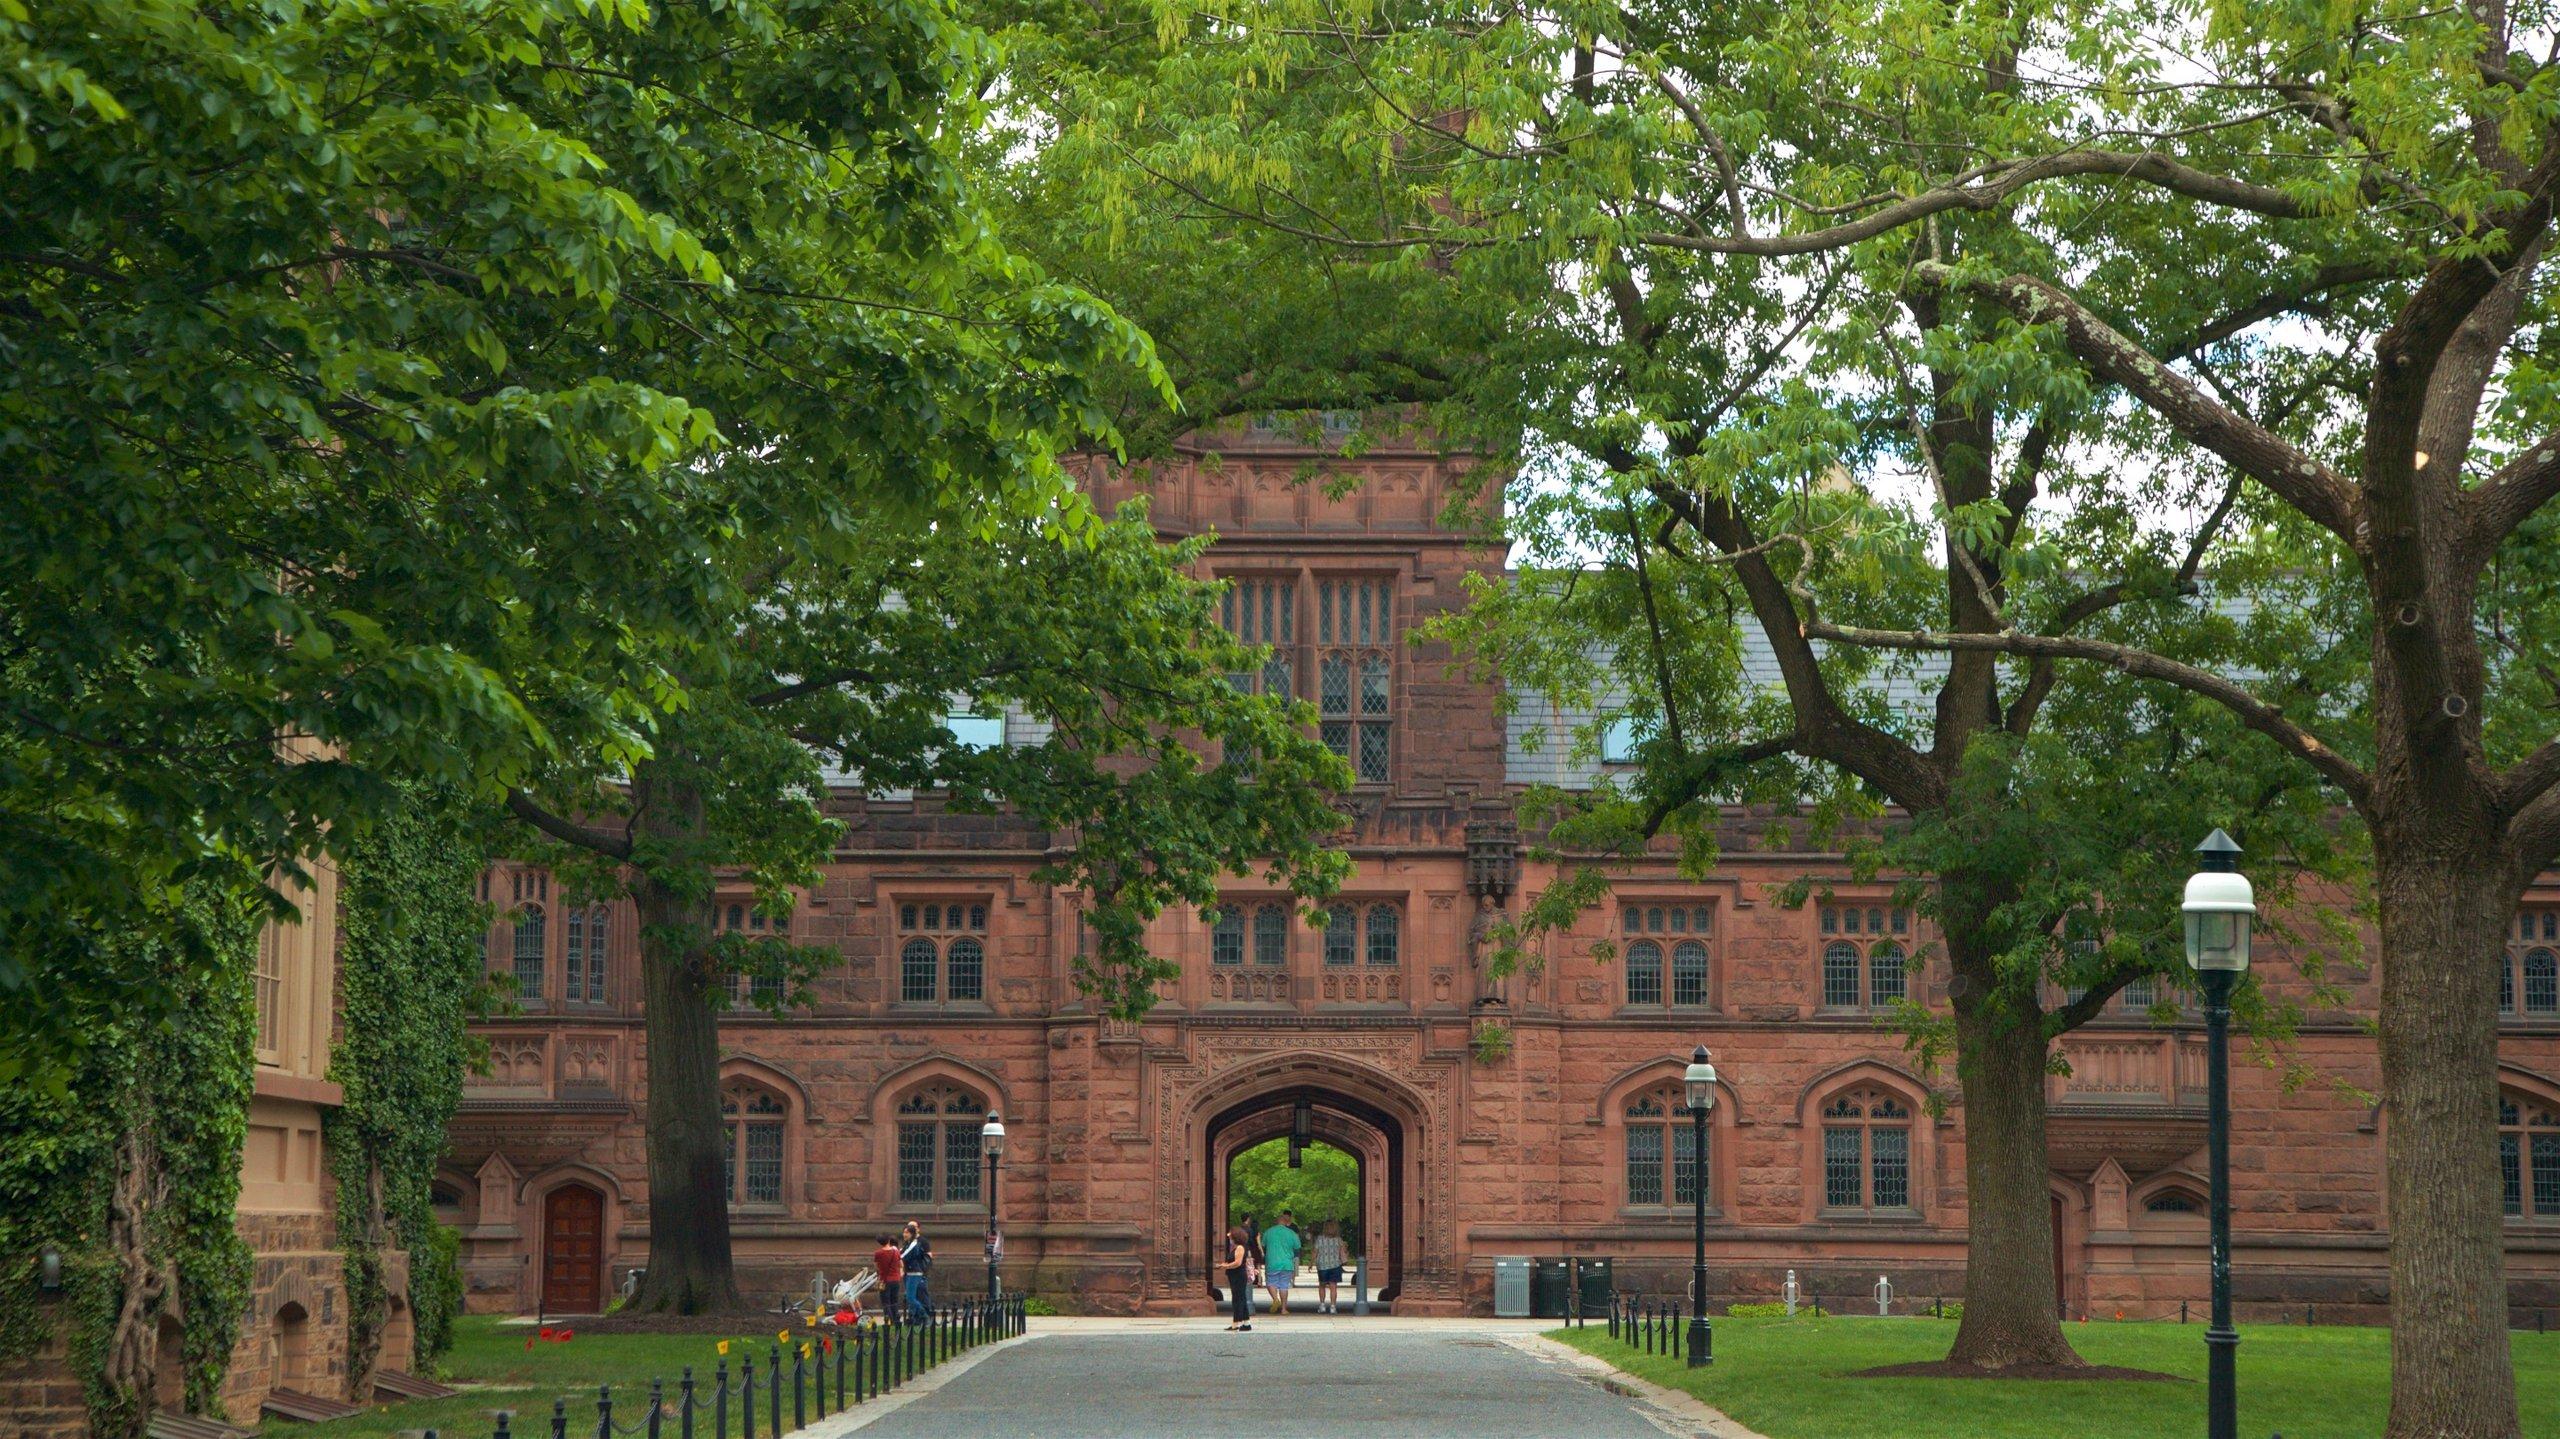 Princeton University, Princeton, New Jersey, United States of America